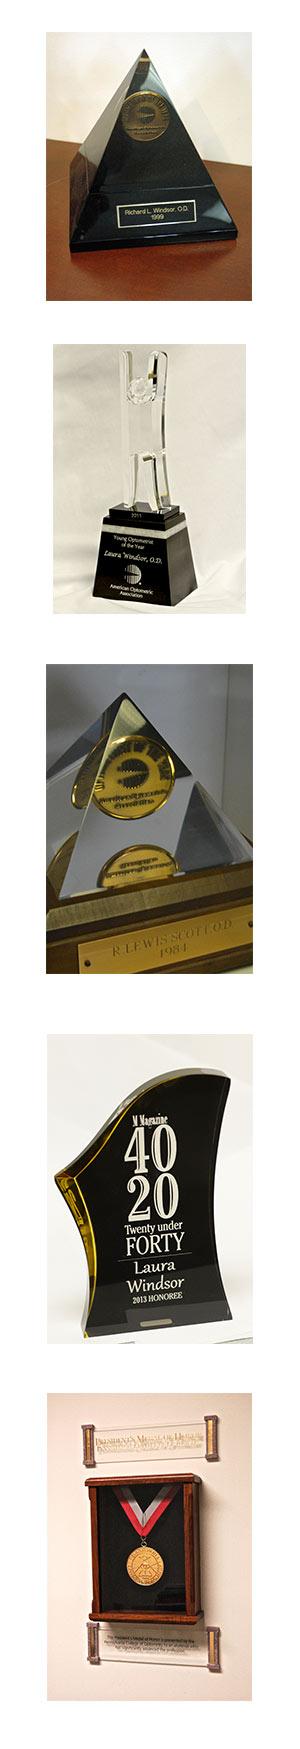 awards-line.jpg